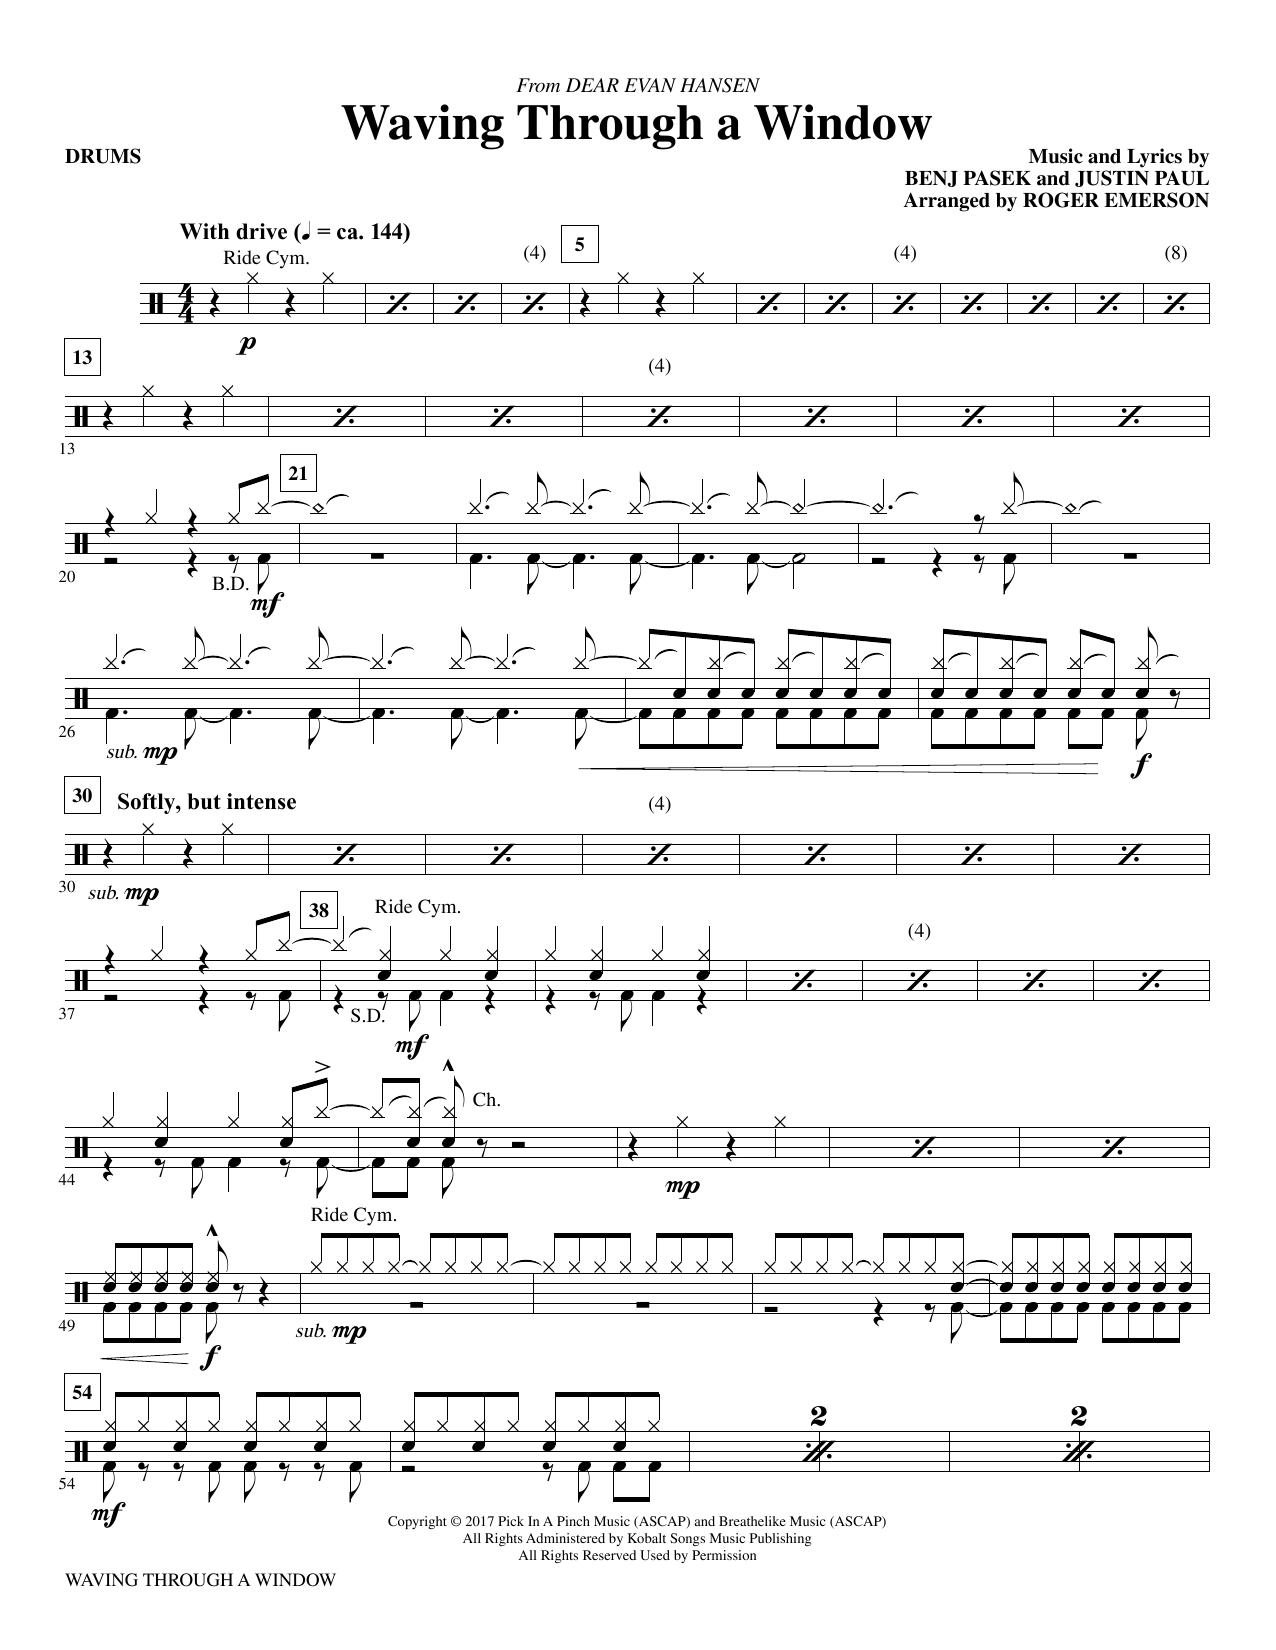 Waving Through a Window - Drums Partituras Digitales